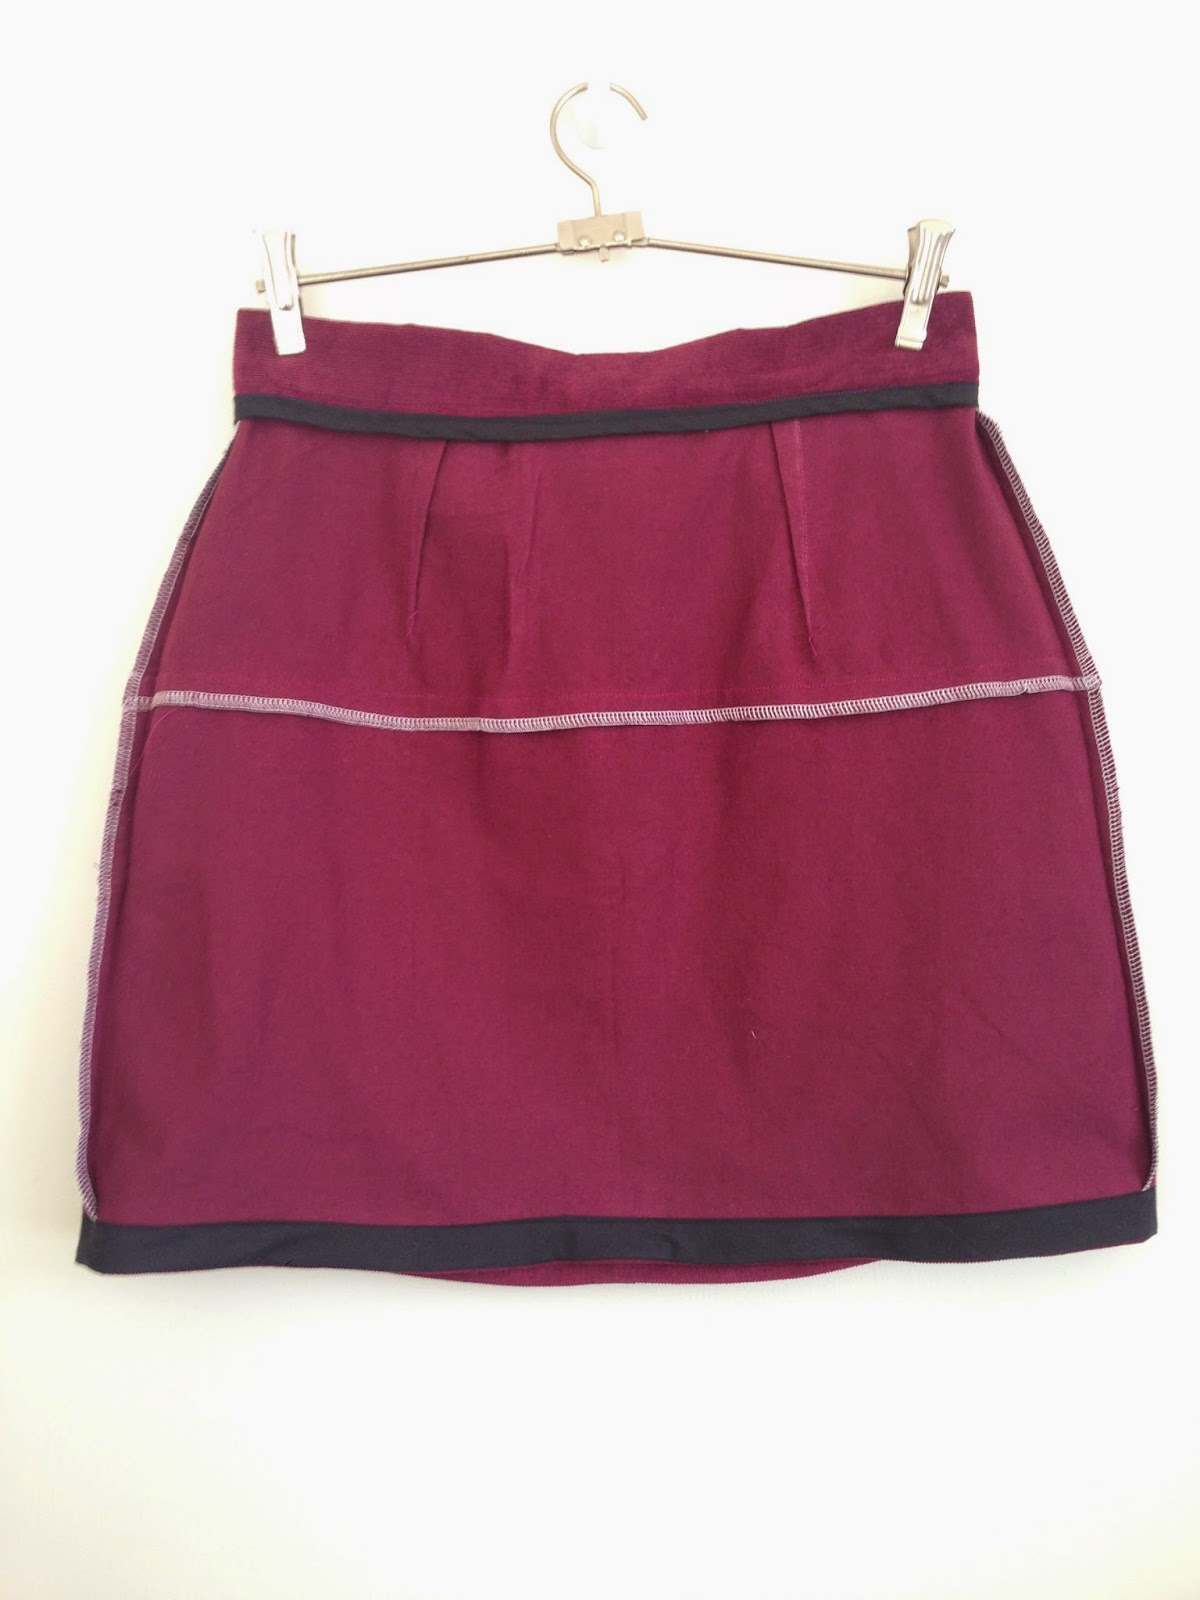 vogue 1247 cord skirt